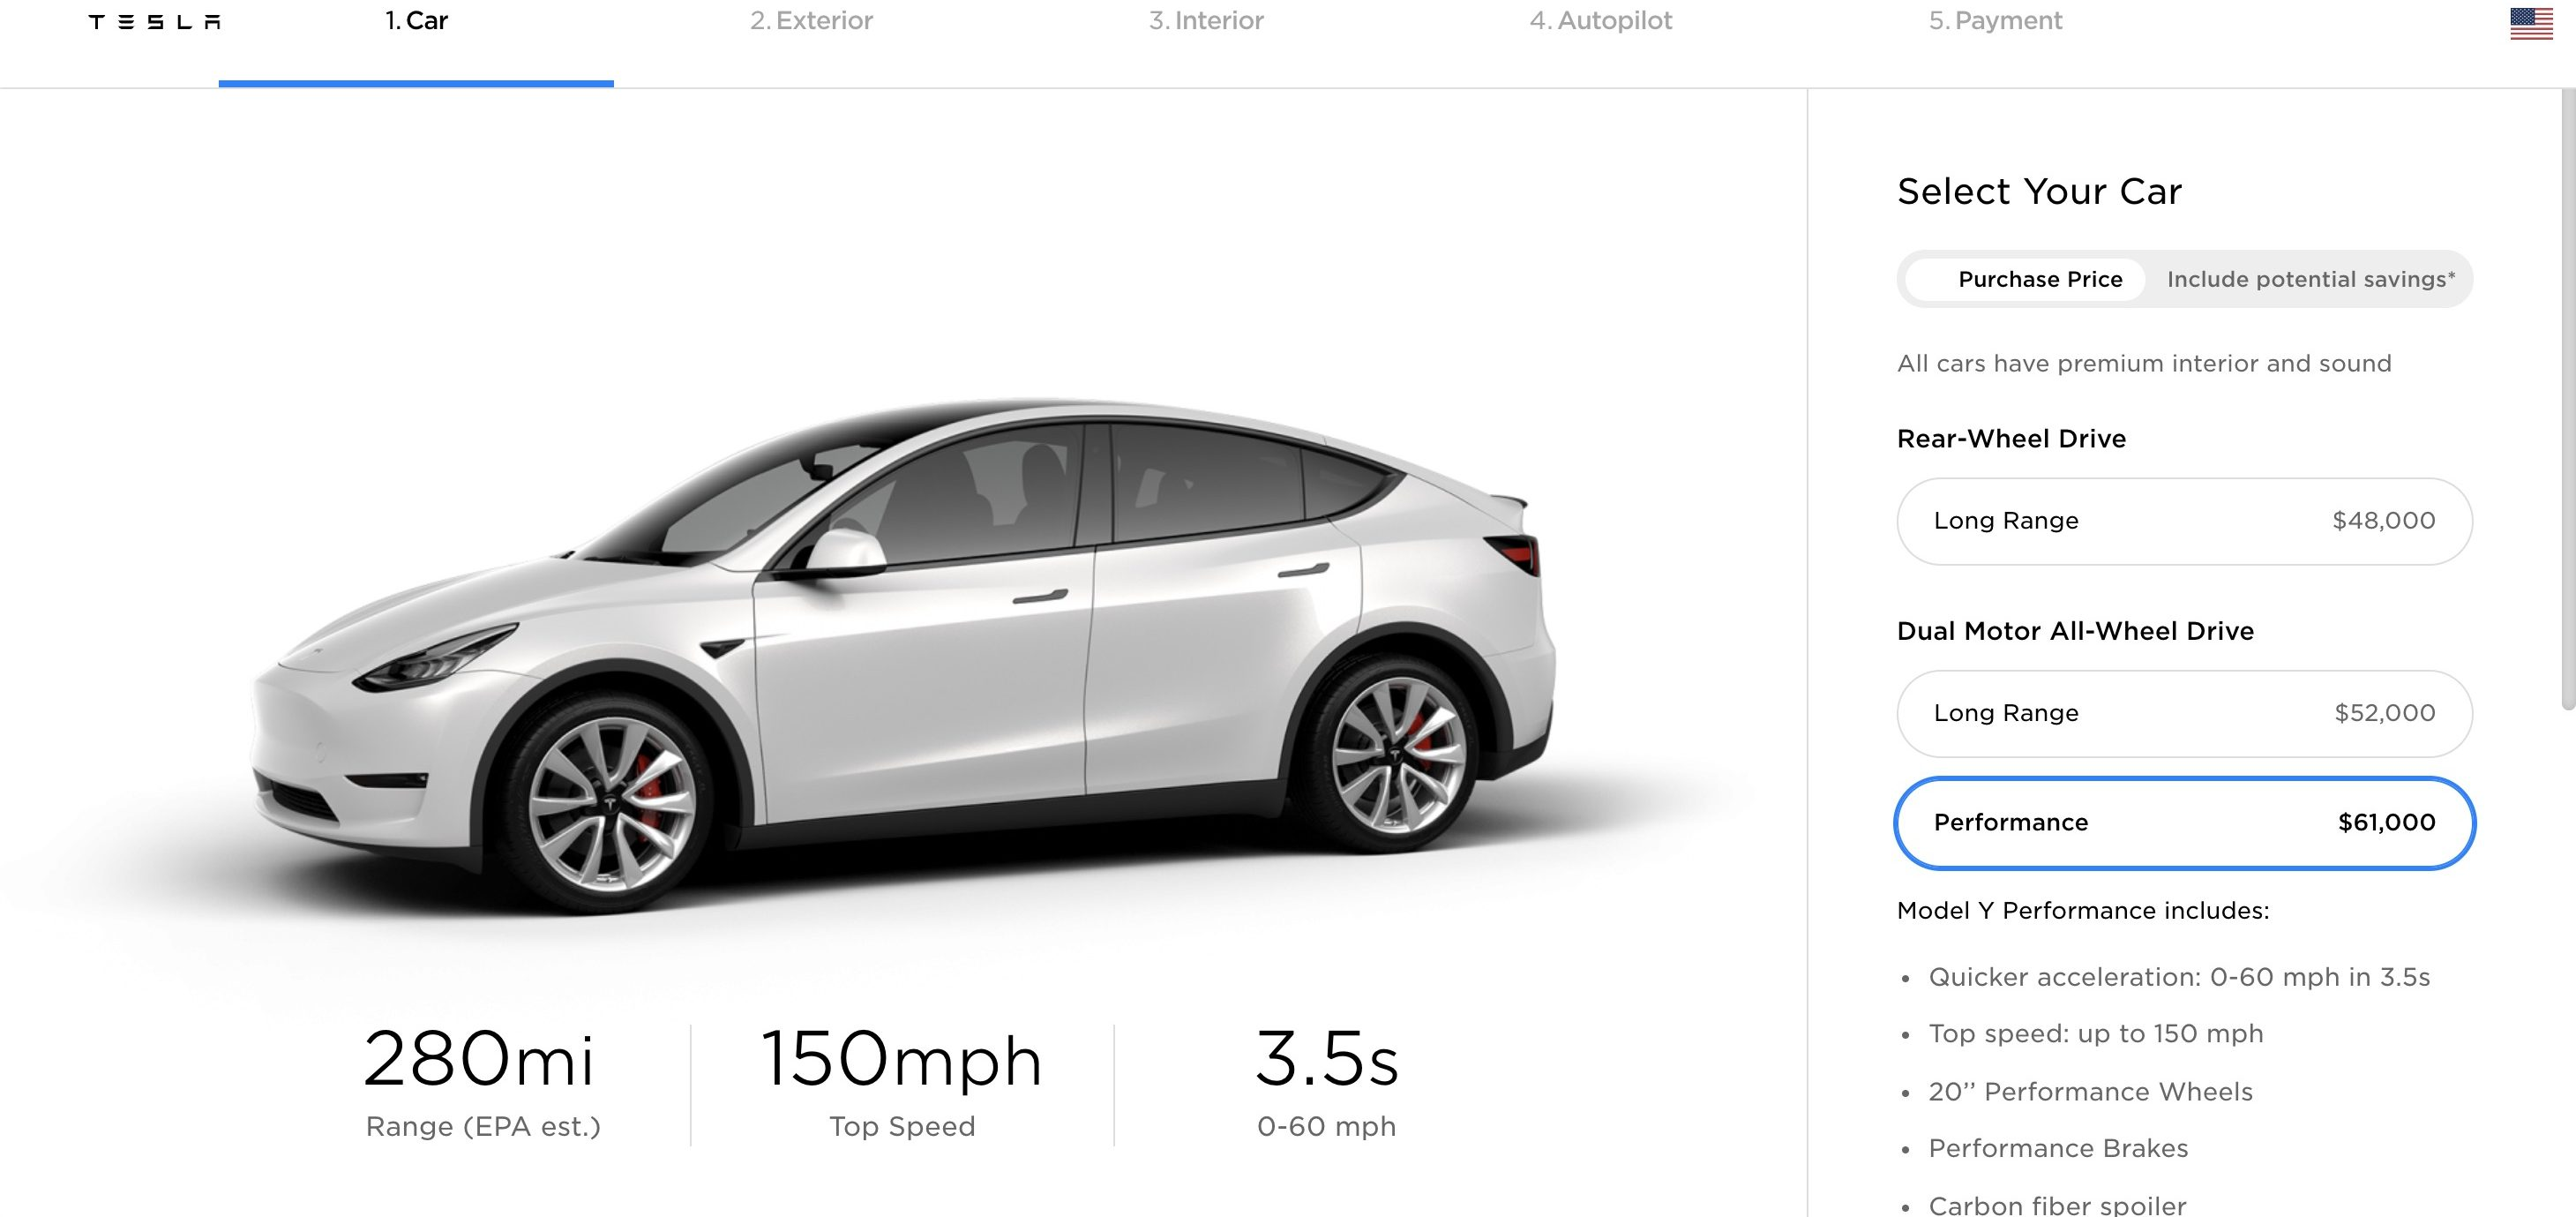 Tesla Model Y gets CARB certification, hinting at deliveries and range - Electrek